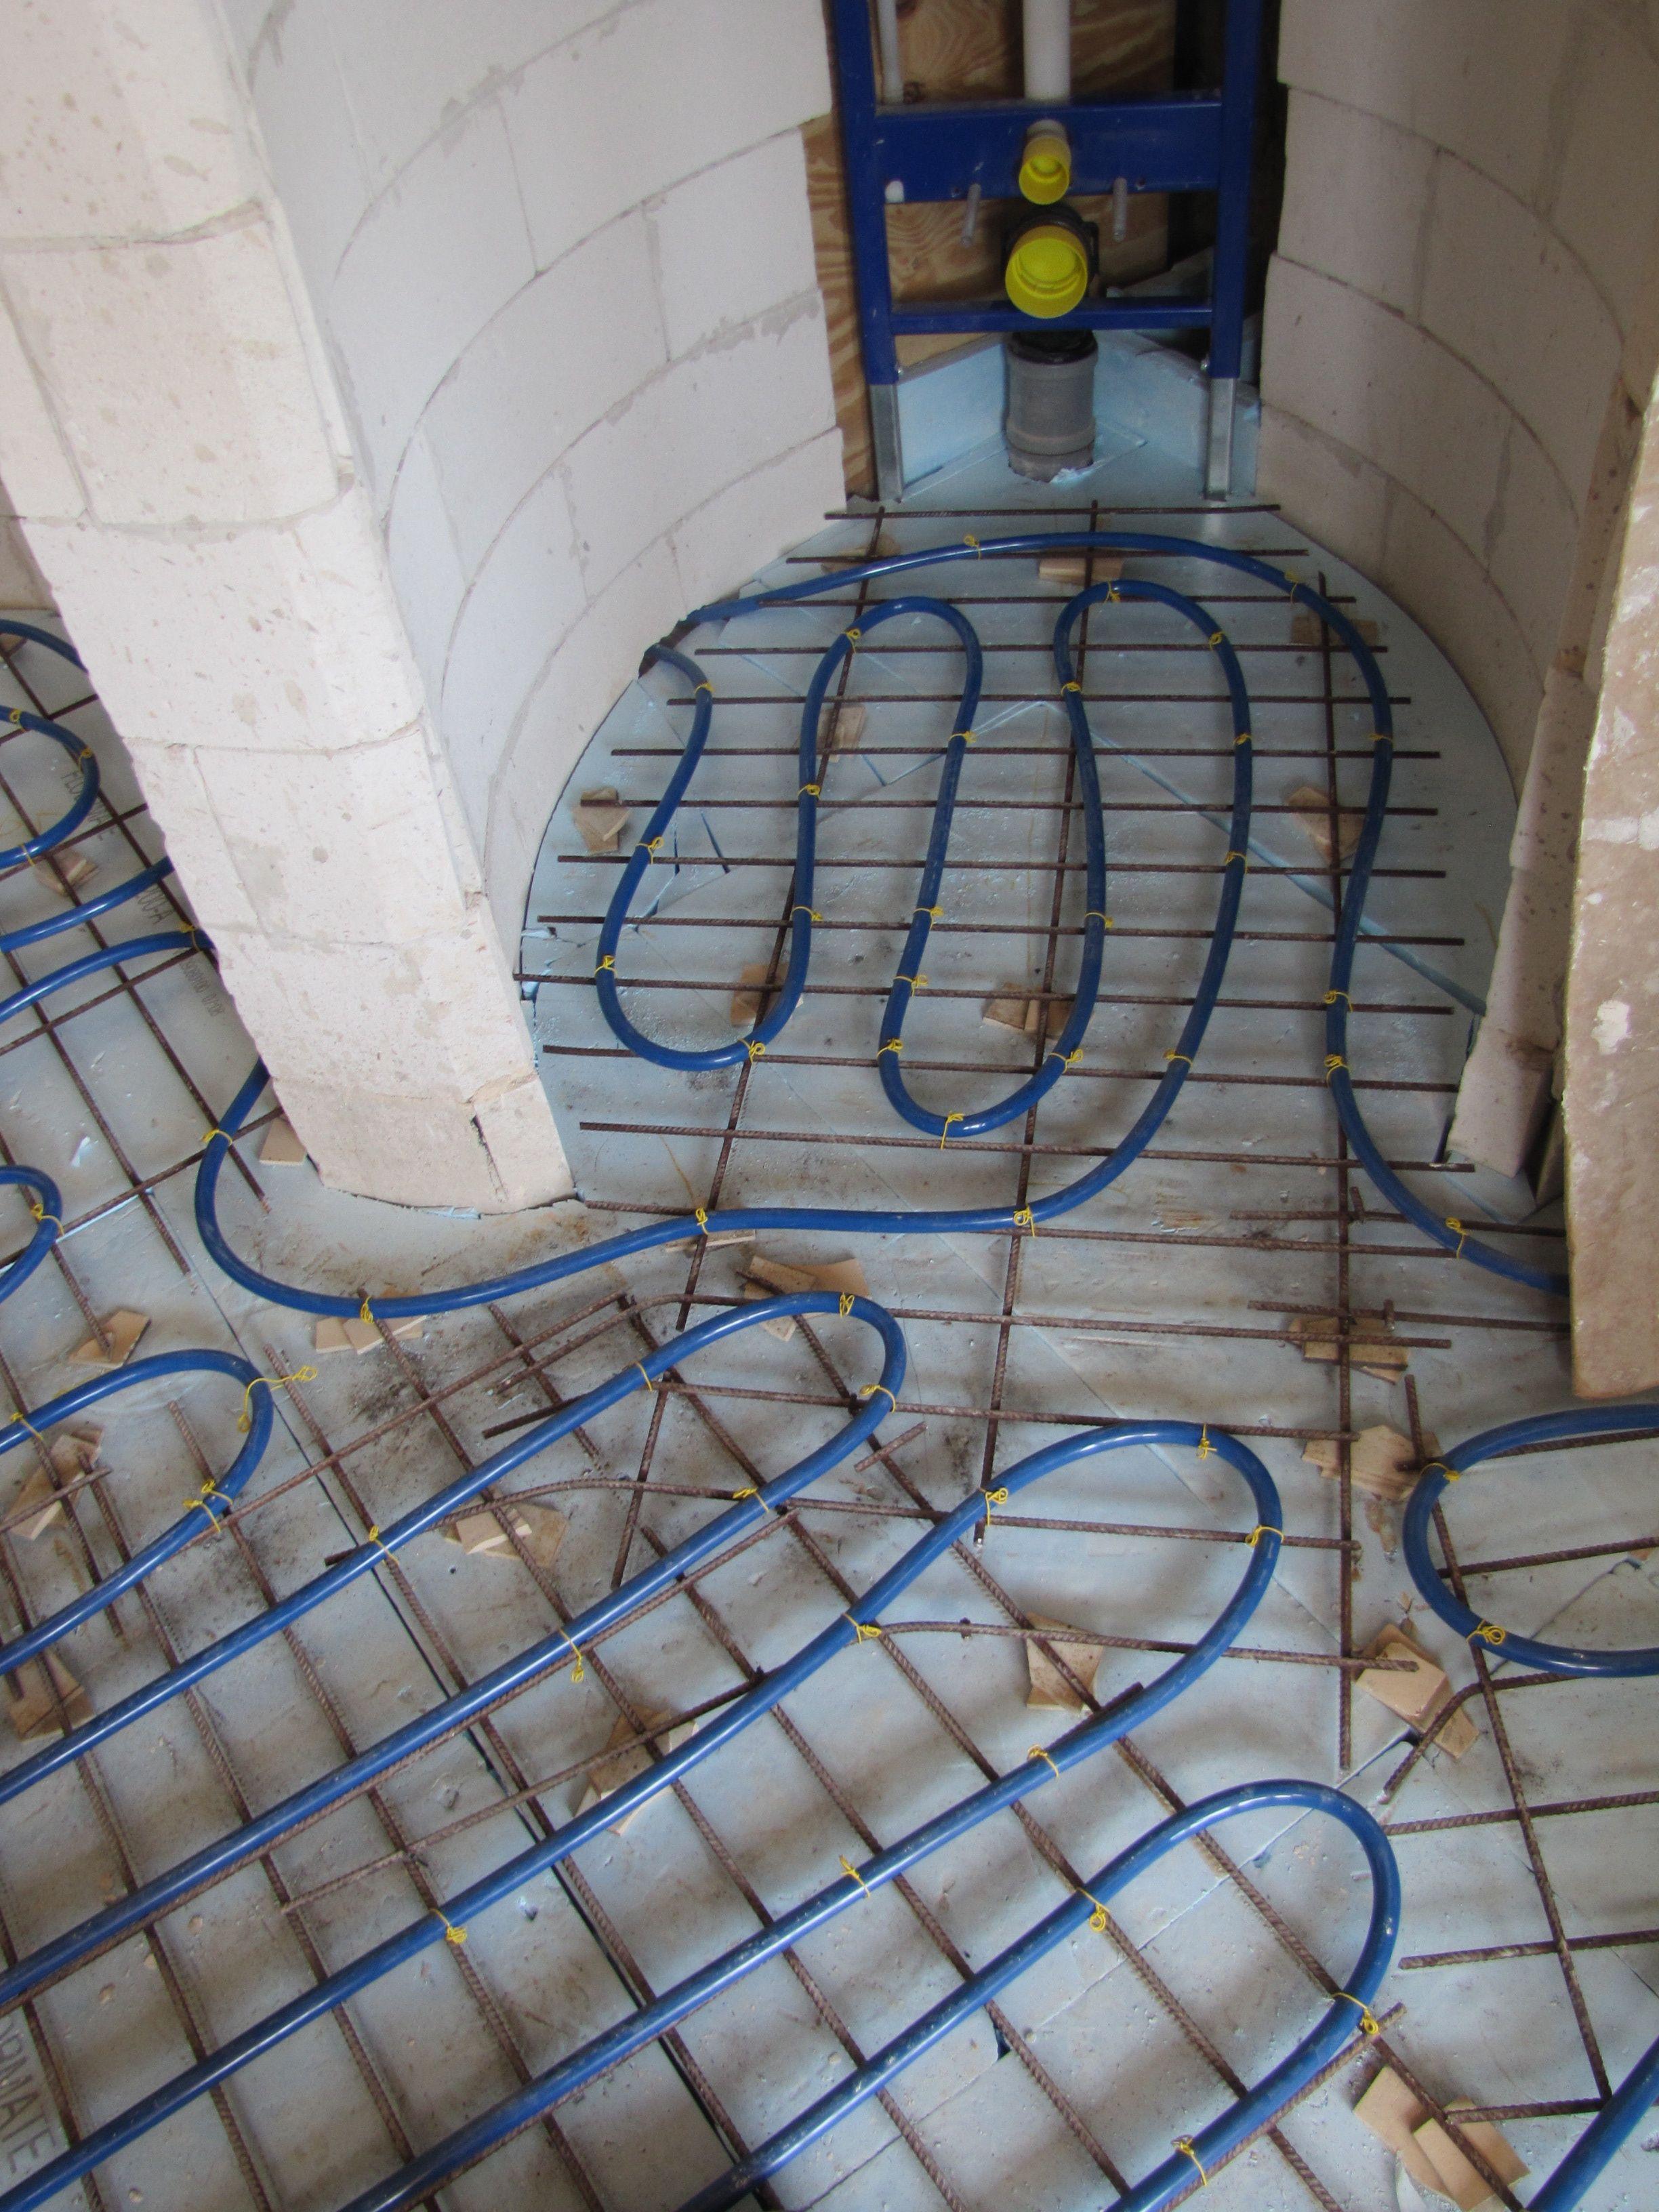 vloerverwarming badkamer | Humberville | Pinterest